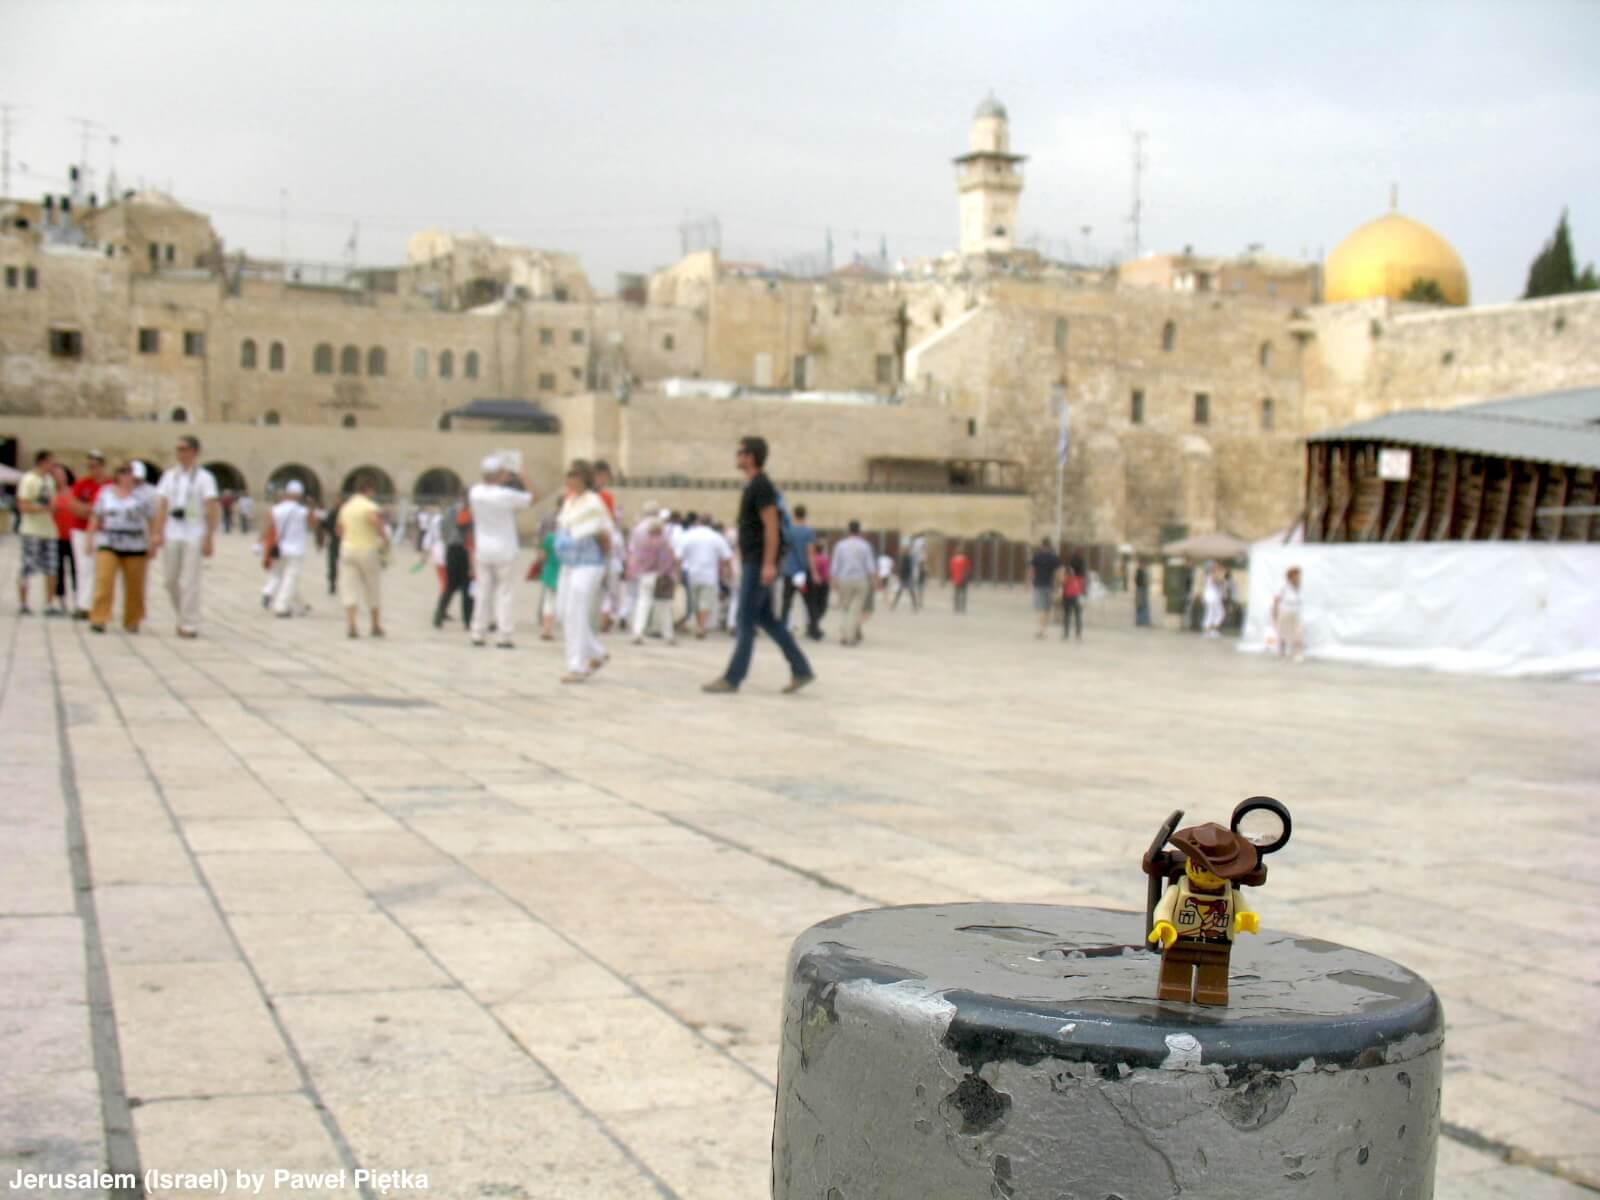 Jerusalem (Israel) – Wailing Wall